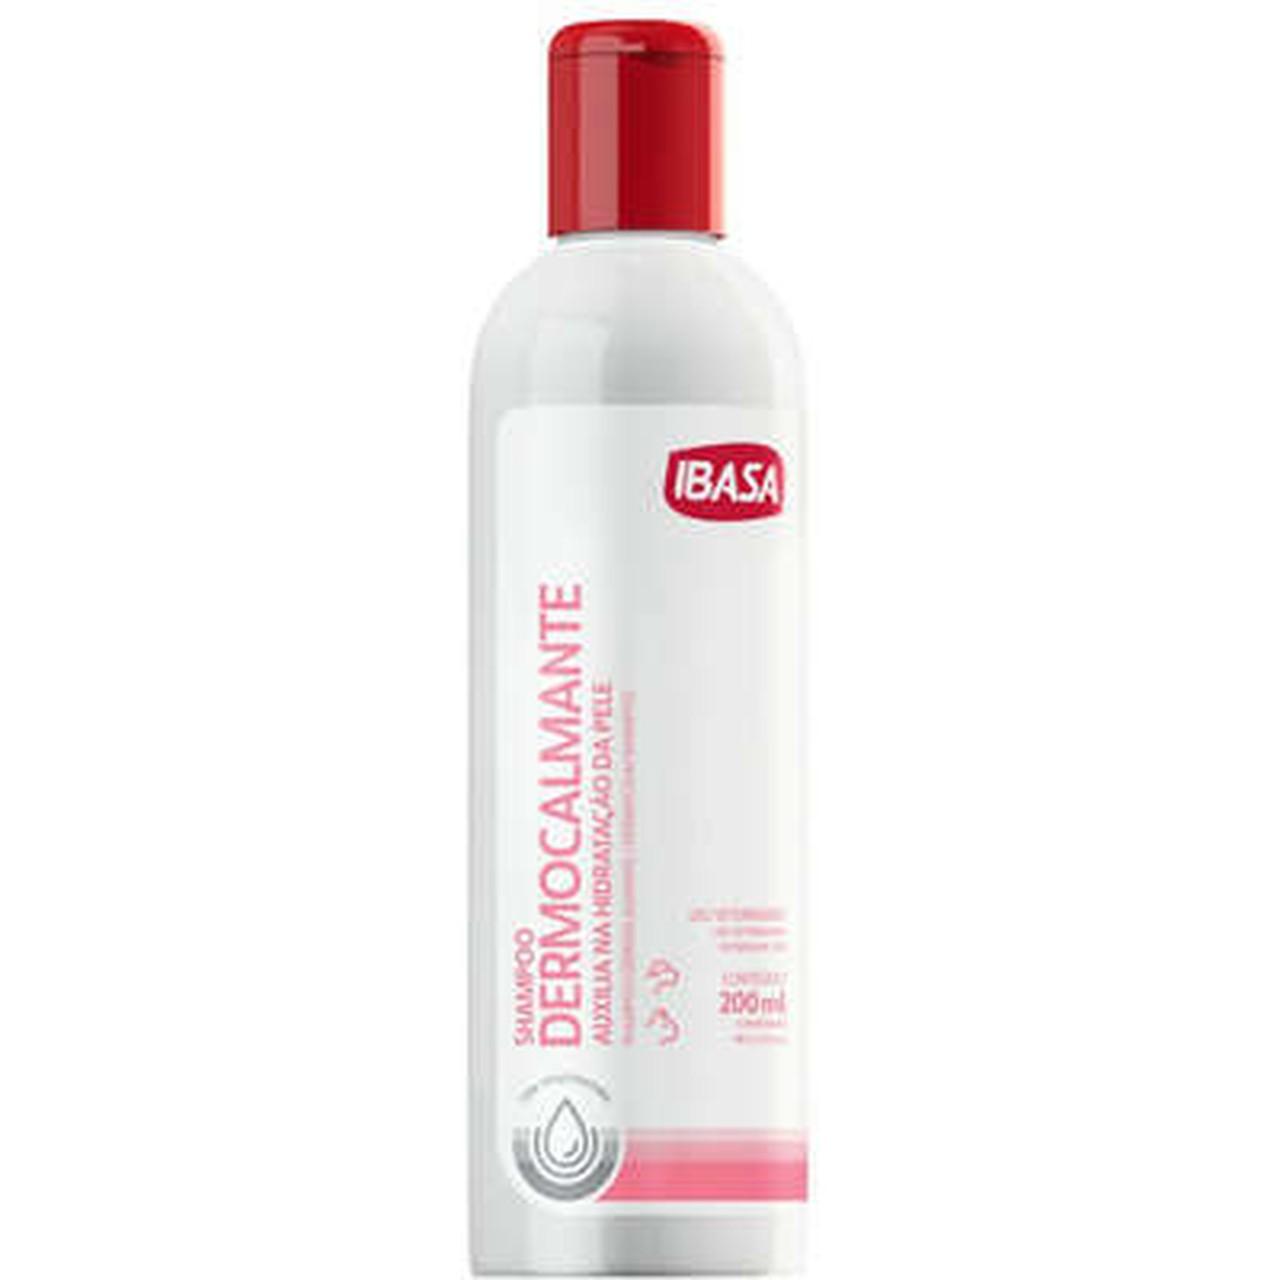 Shampoo Dermocalmante Ibasa para Cães e Gatos